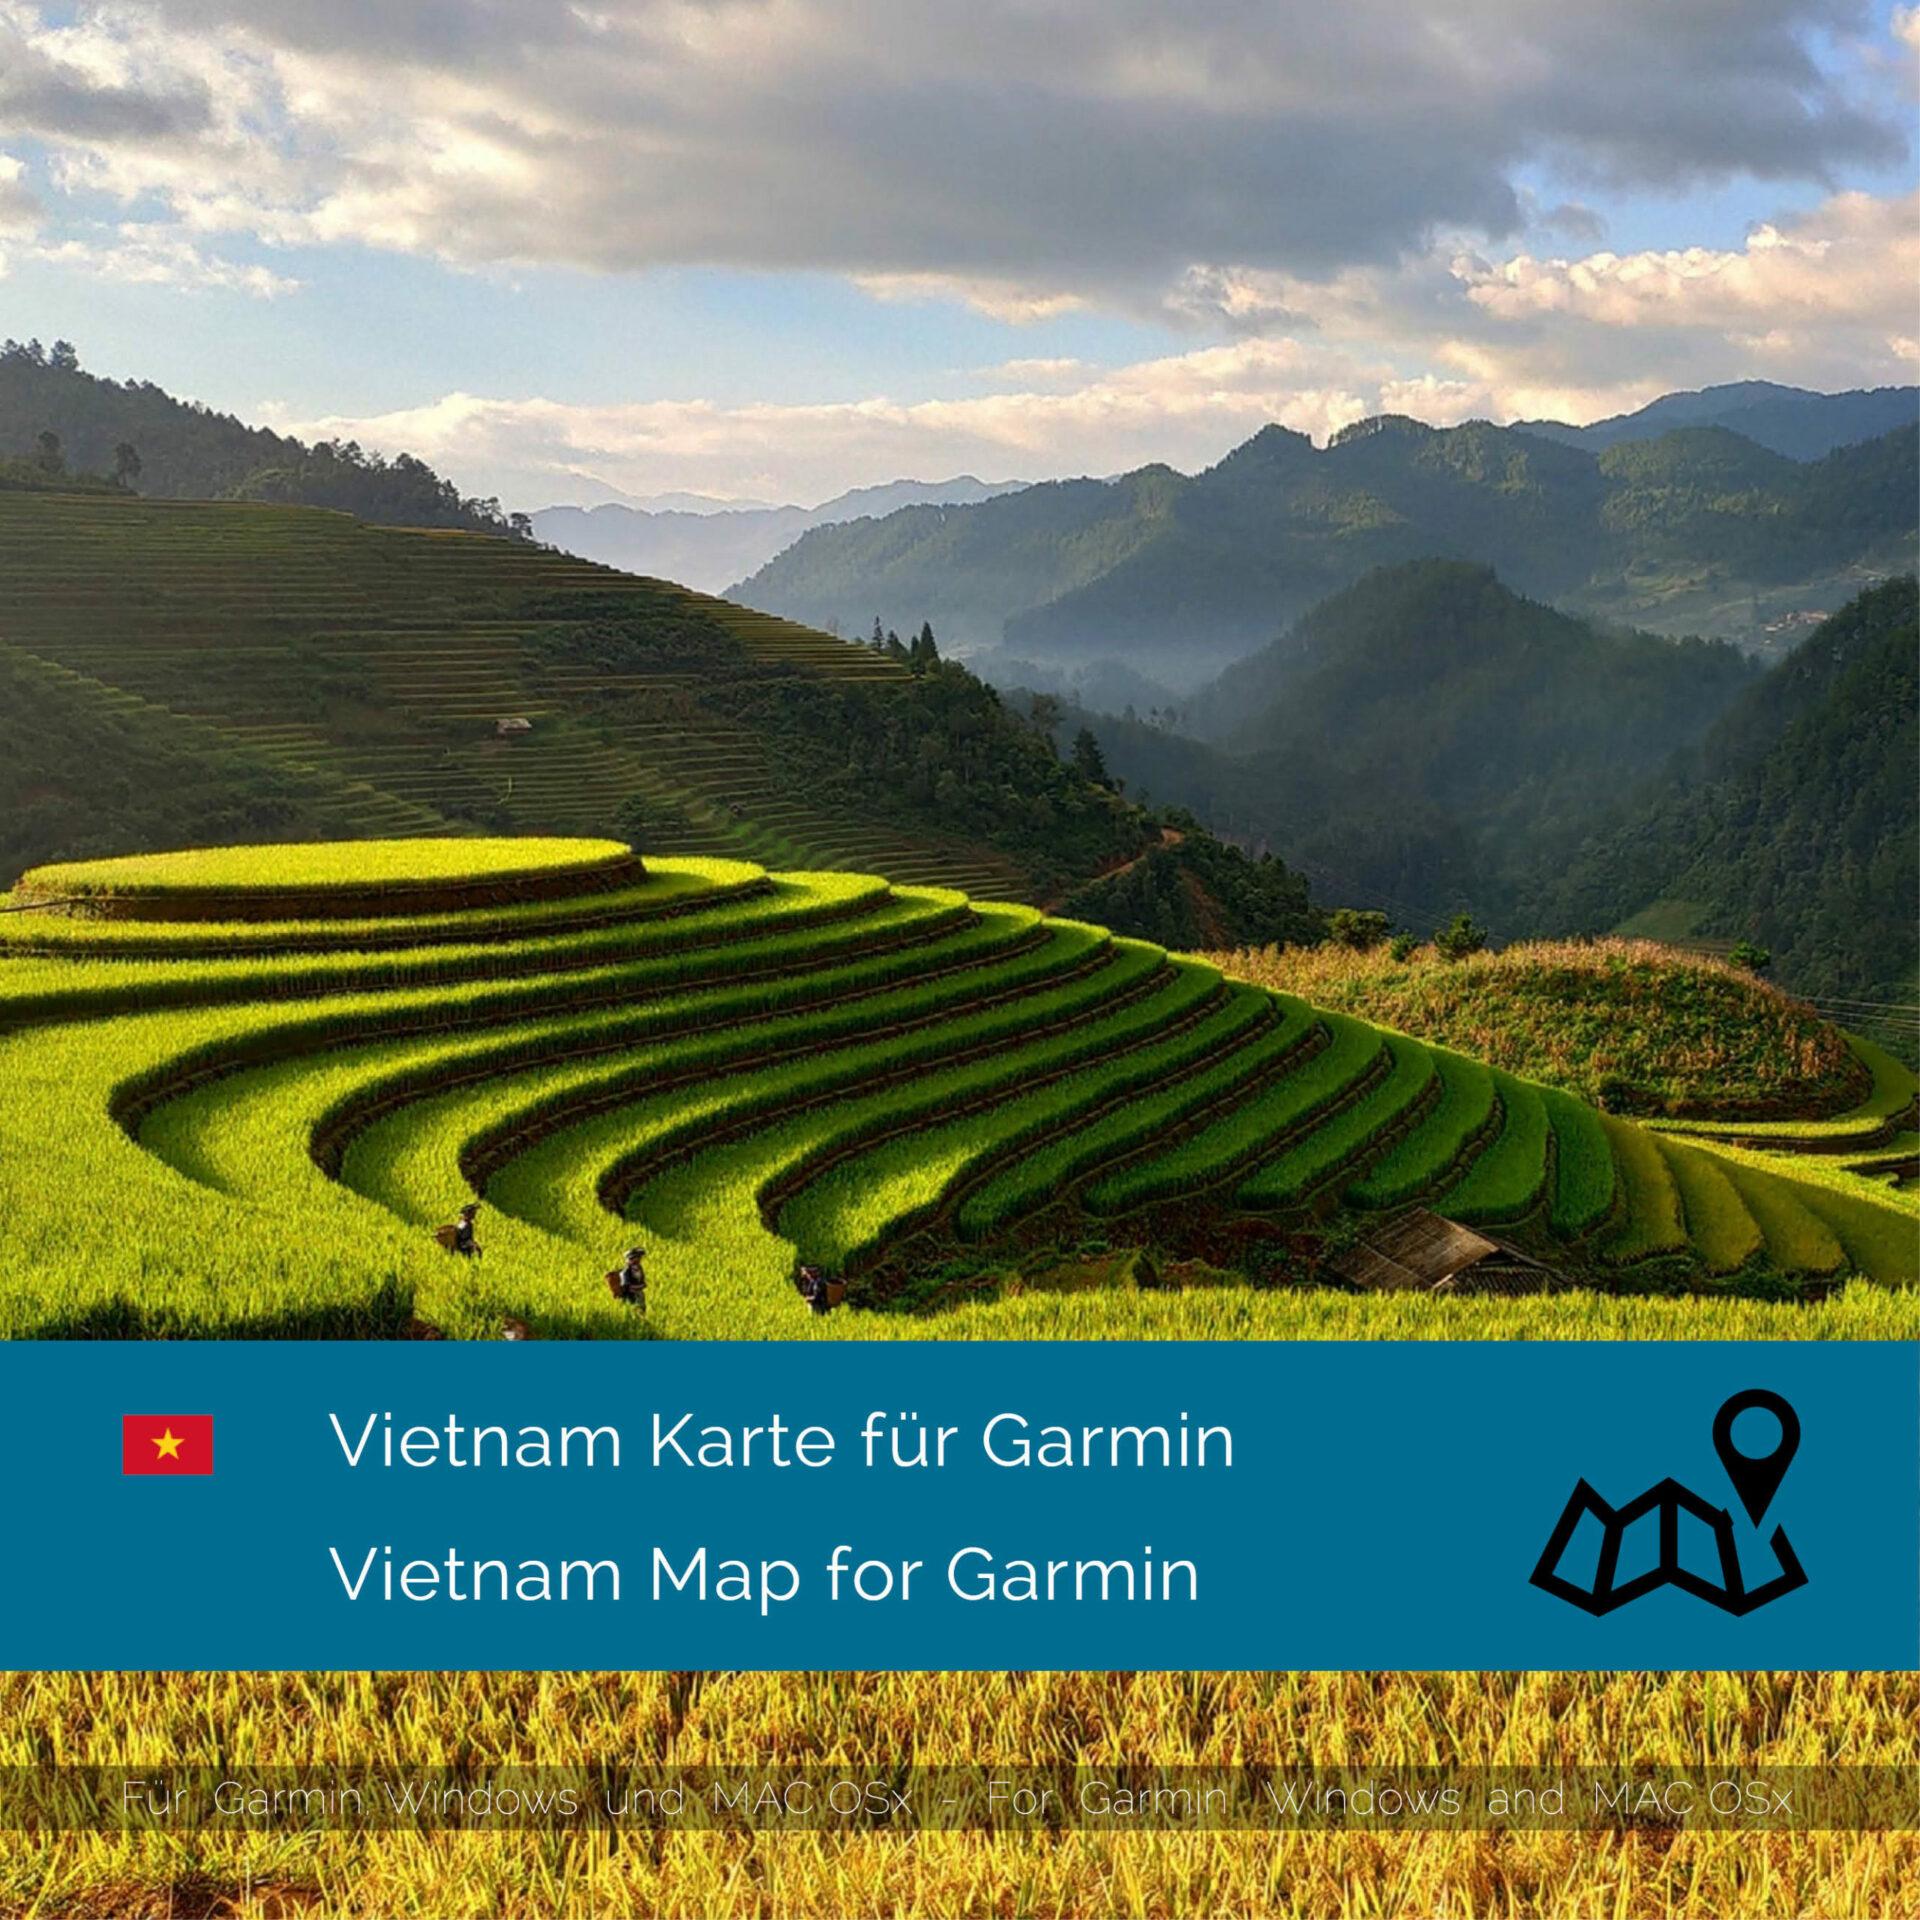 Vietnam Download Gps Map For Garmin Garmin Worldmaps